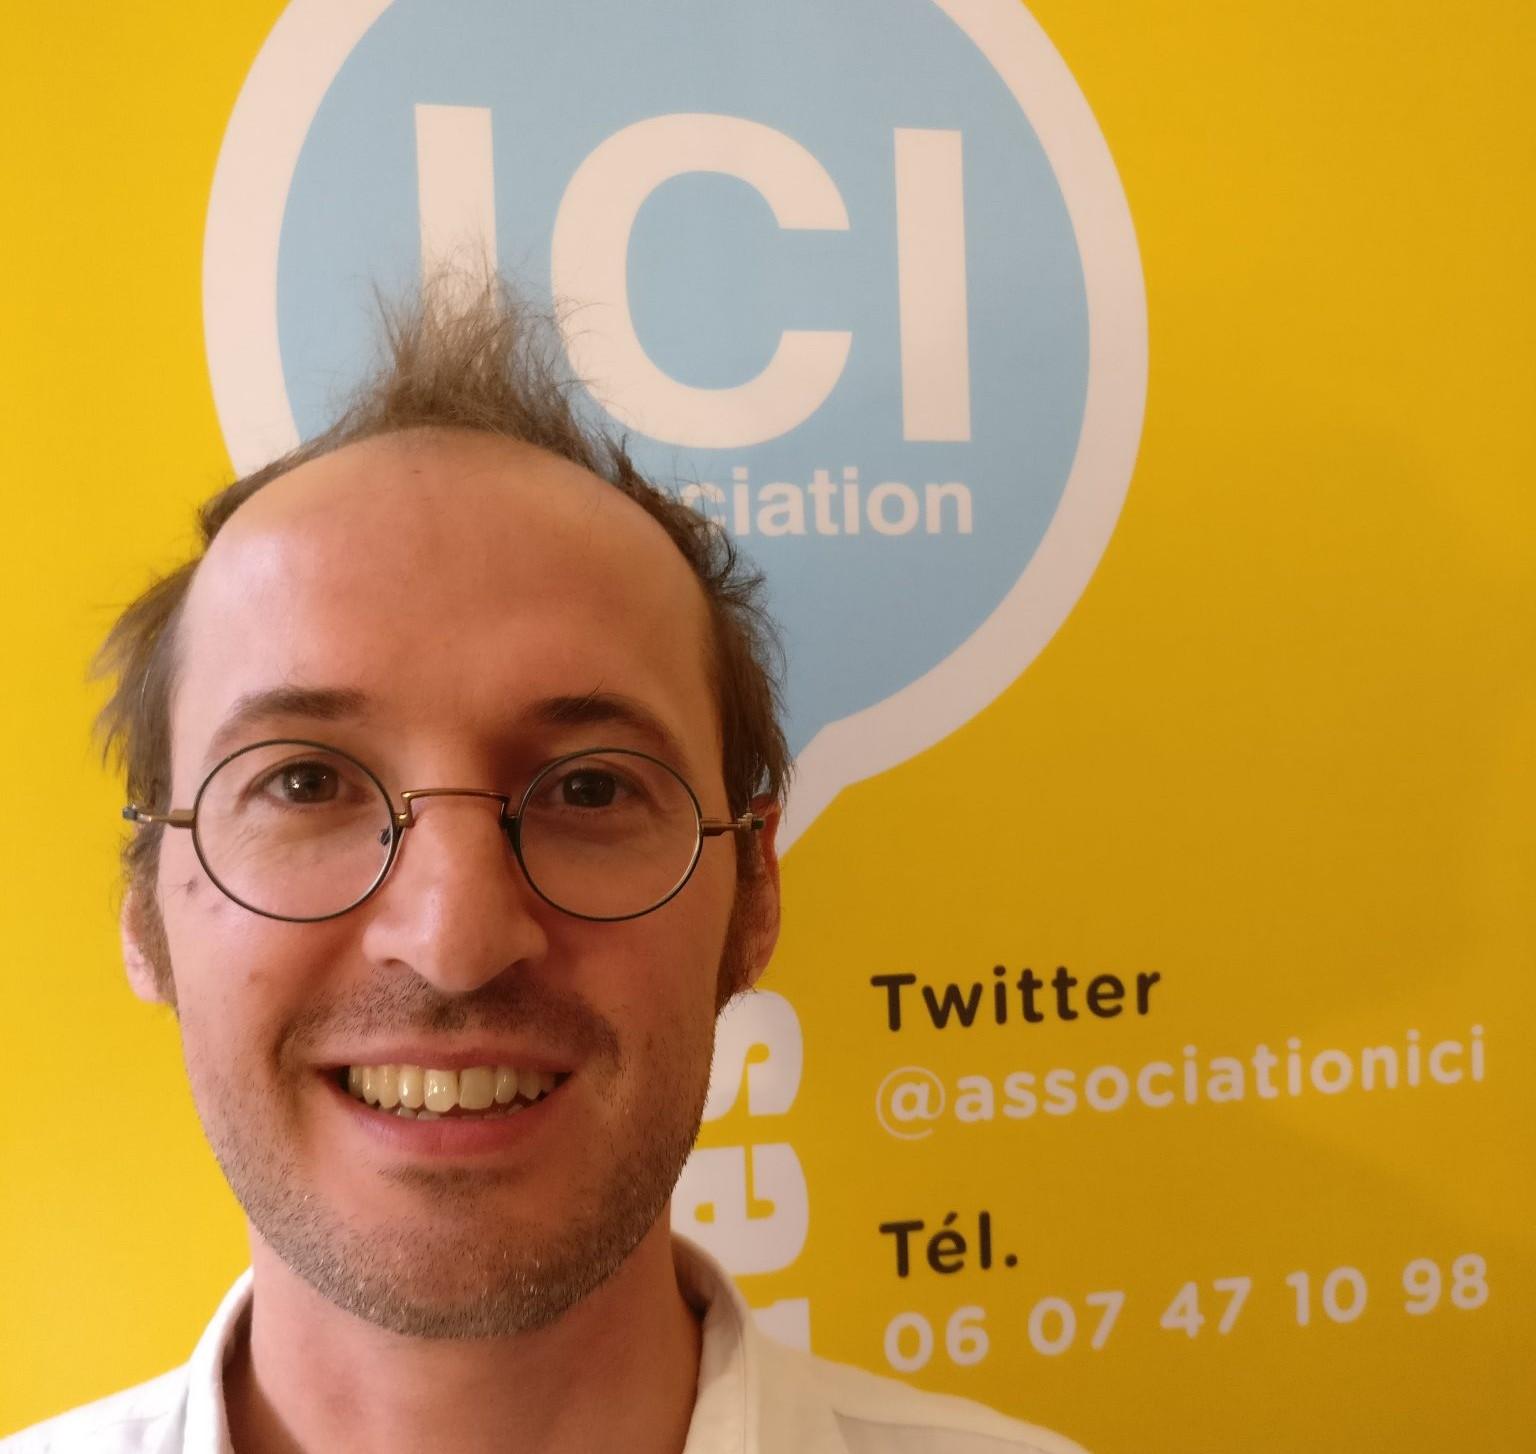 Joachim Pasquet - Secrétaire Association ICI 2017